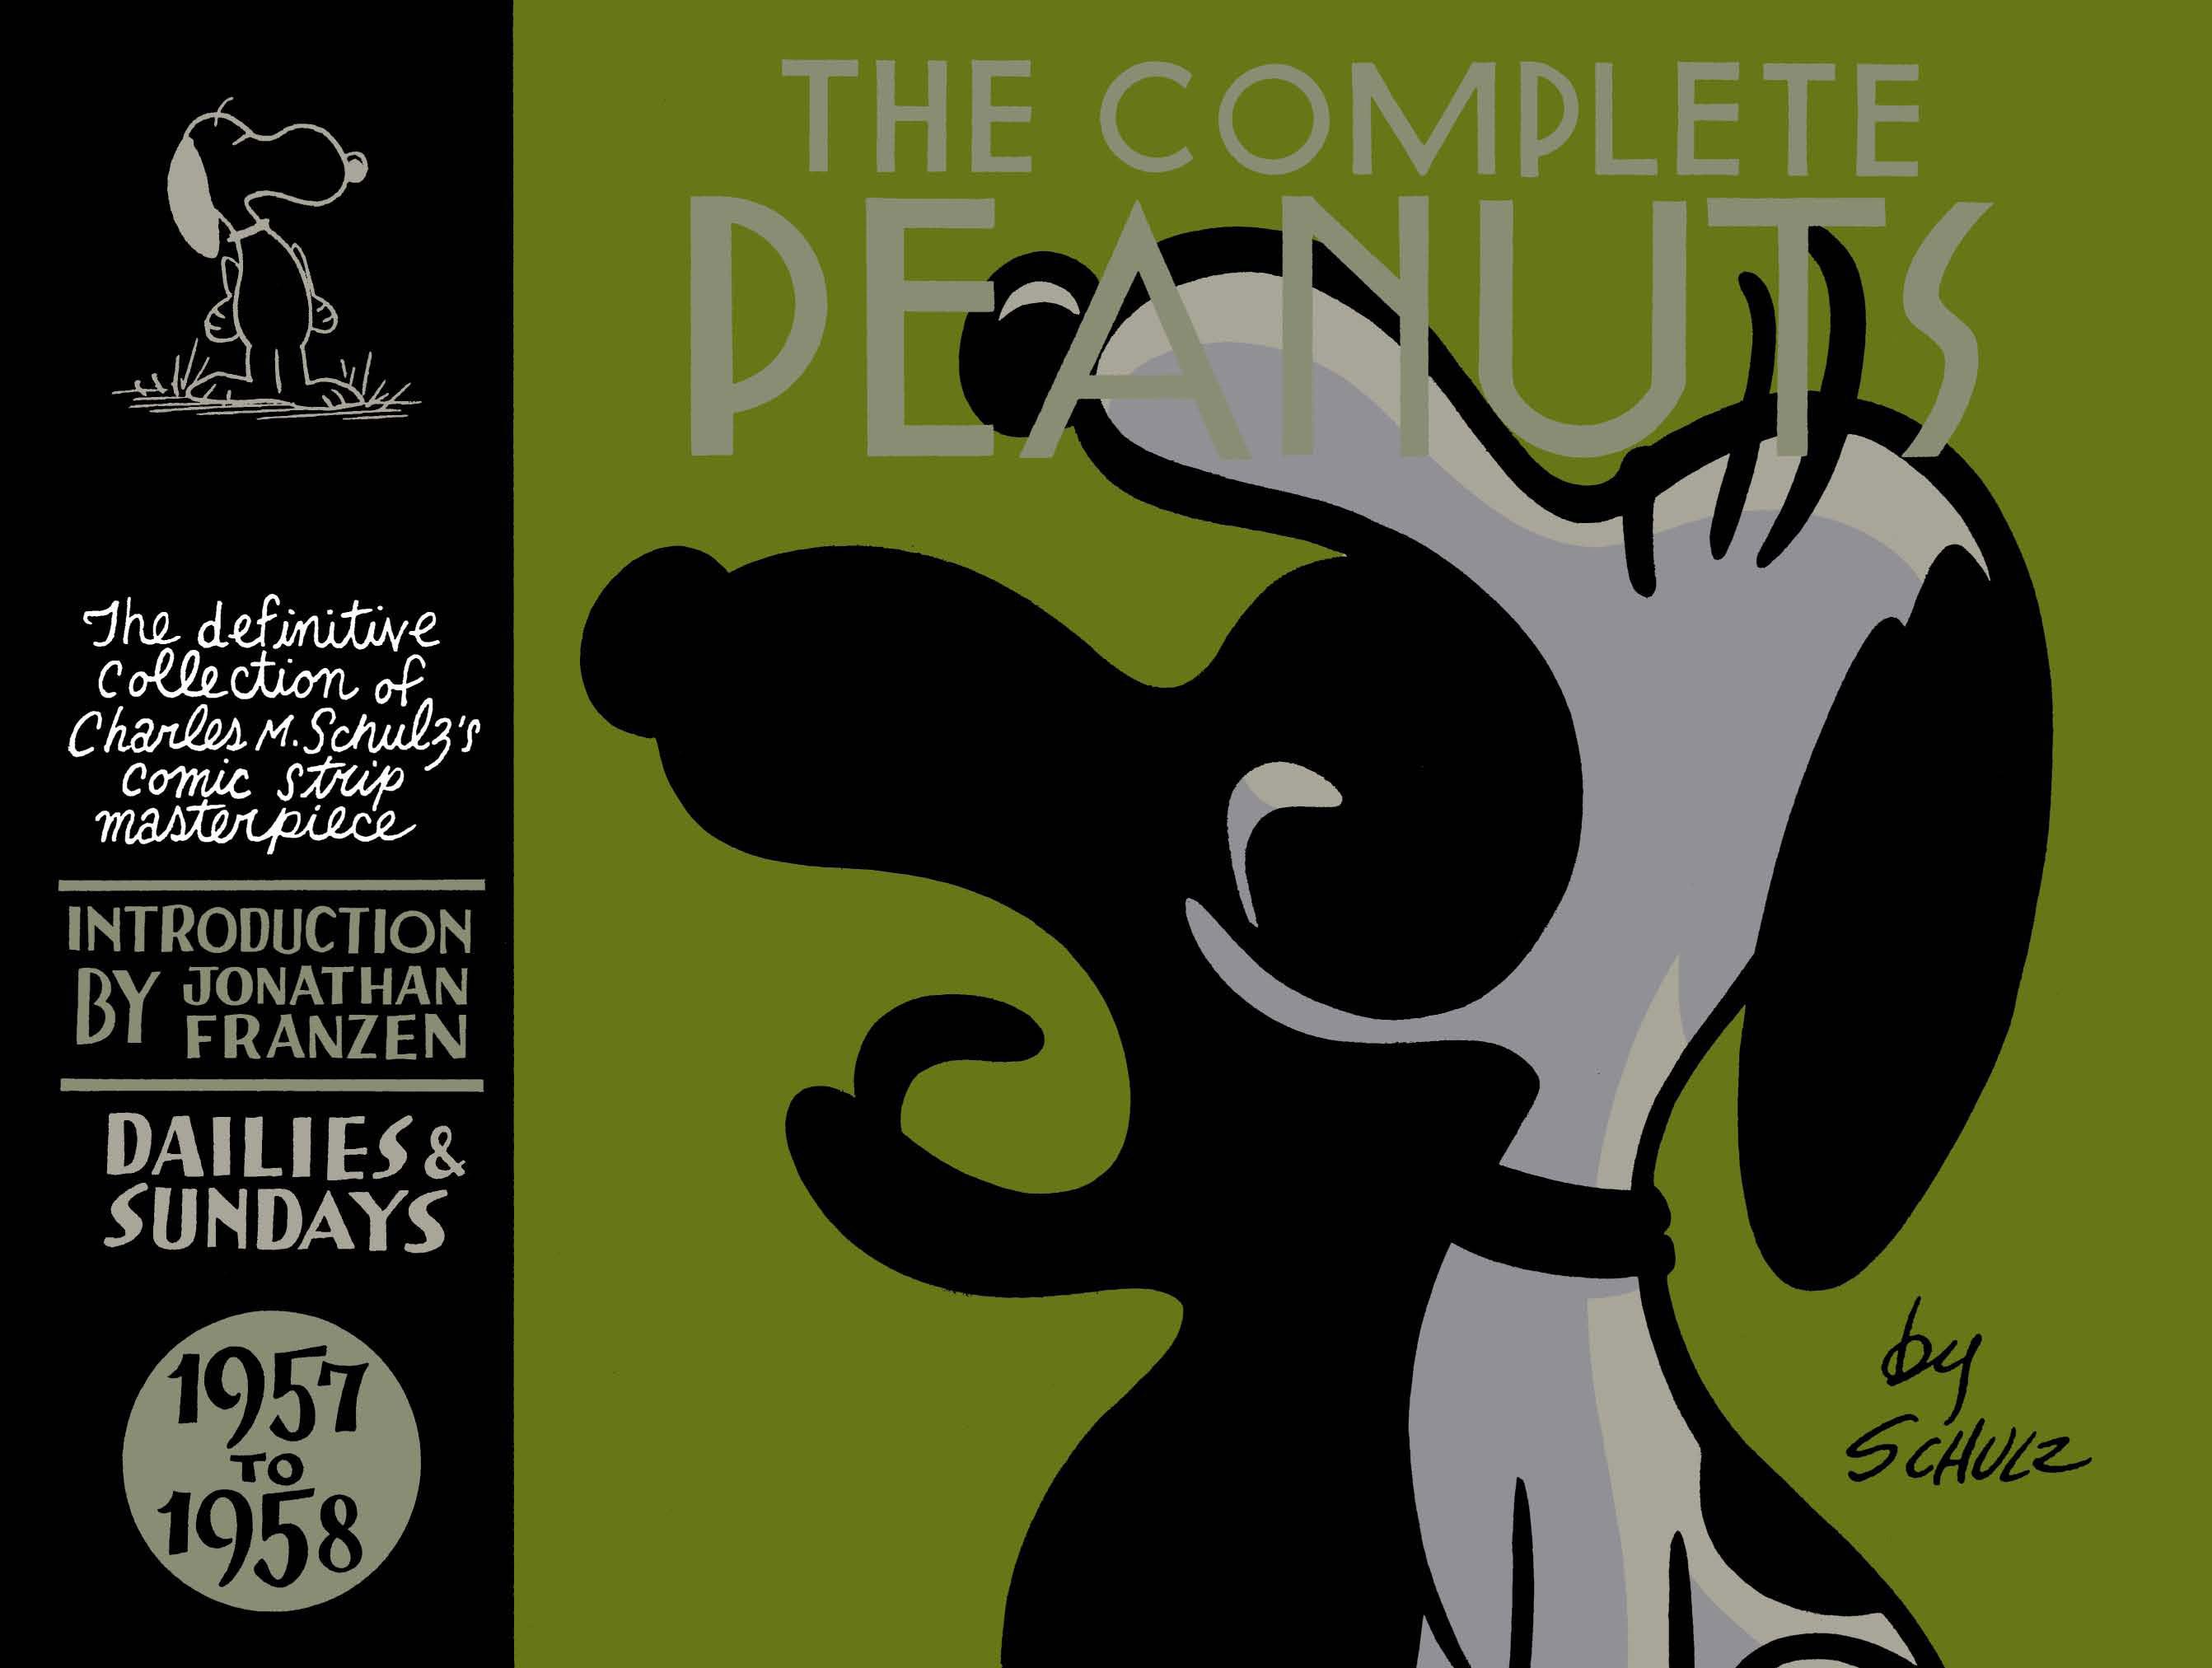 The Complete Peanuts, Vol. 4: 1957-1958